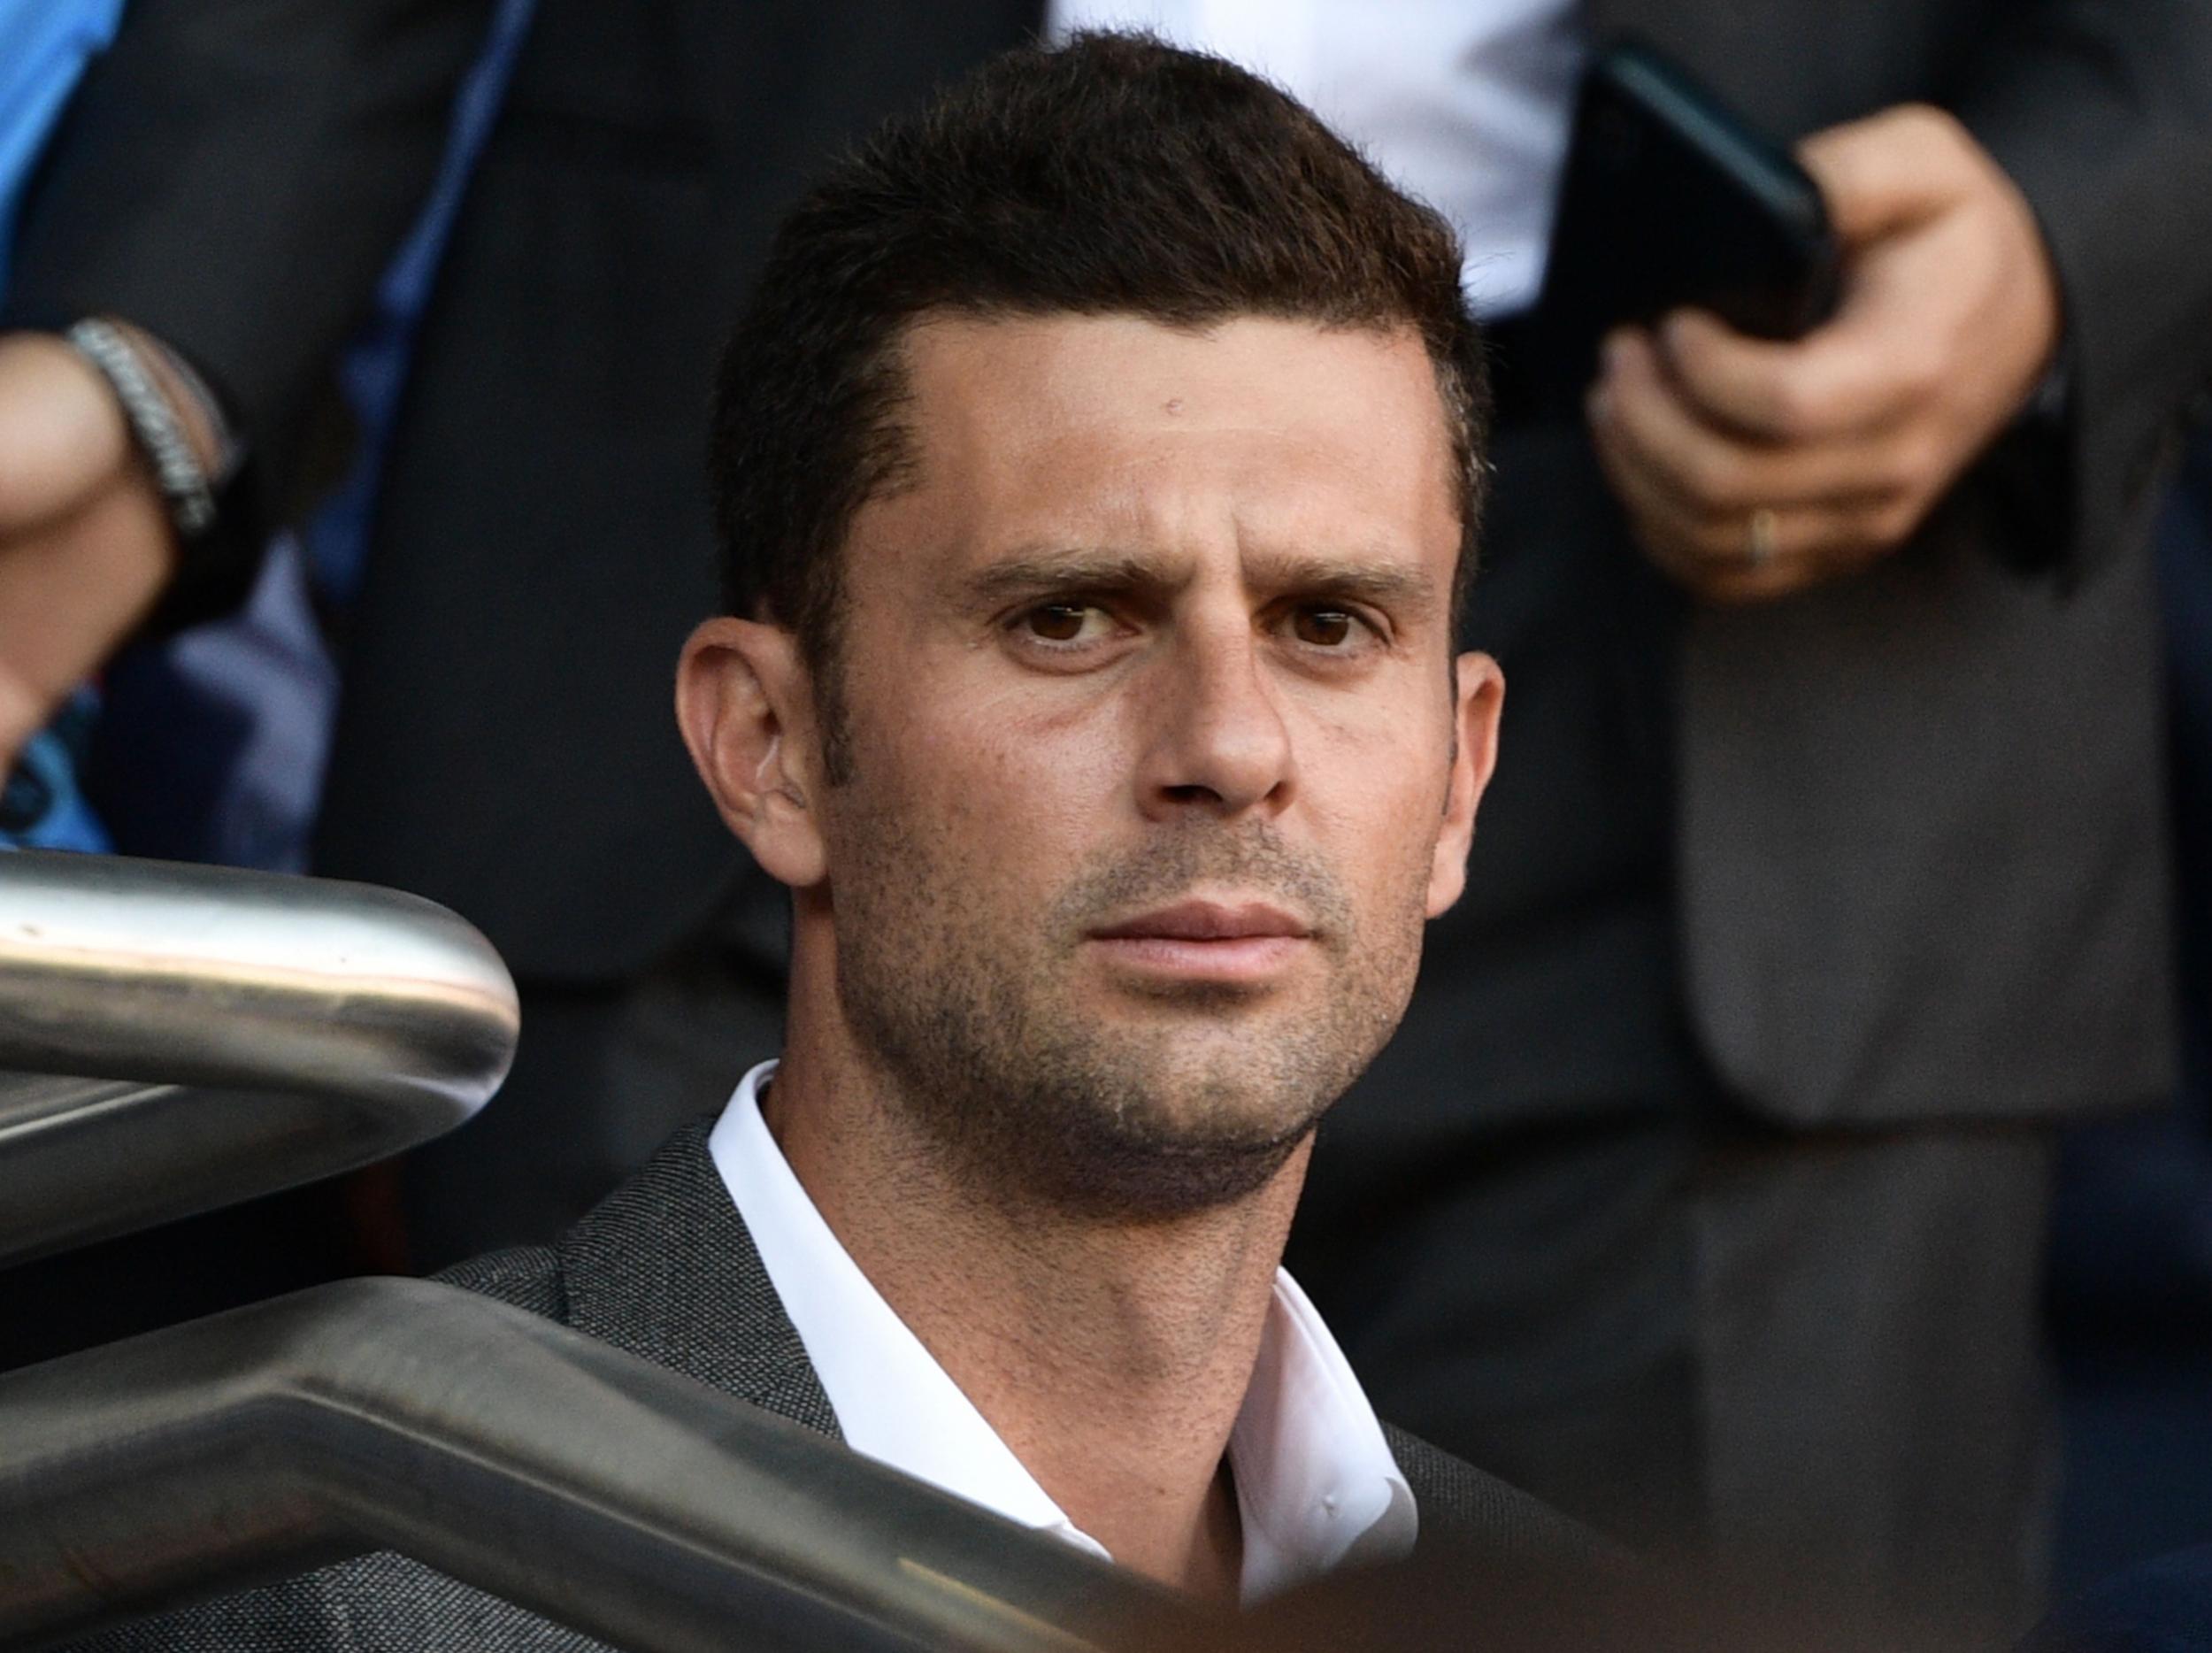 Genoa appoint former Paris Saint-Germain midfielder Thiago Motta as new head coach